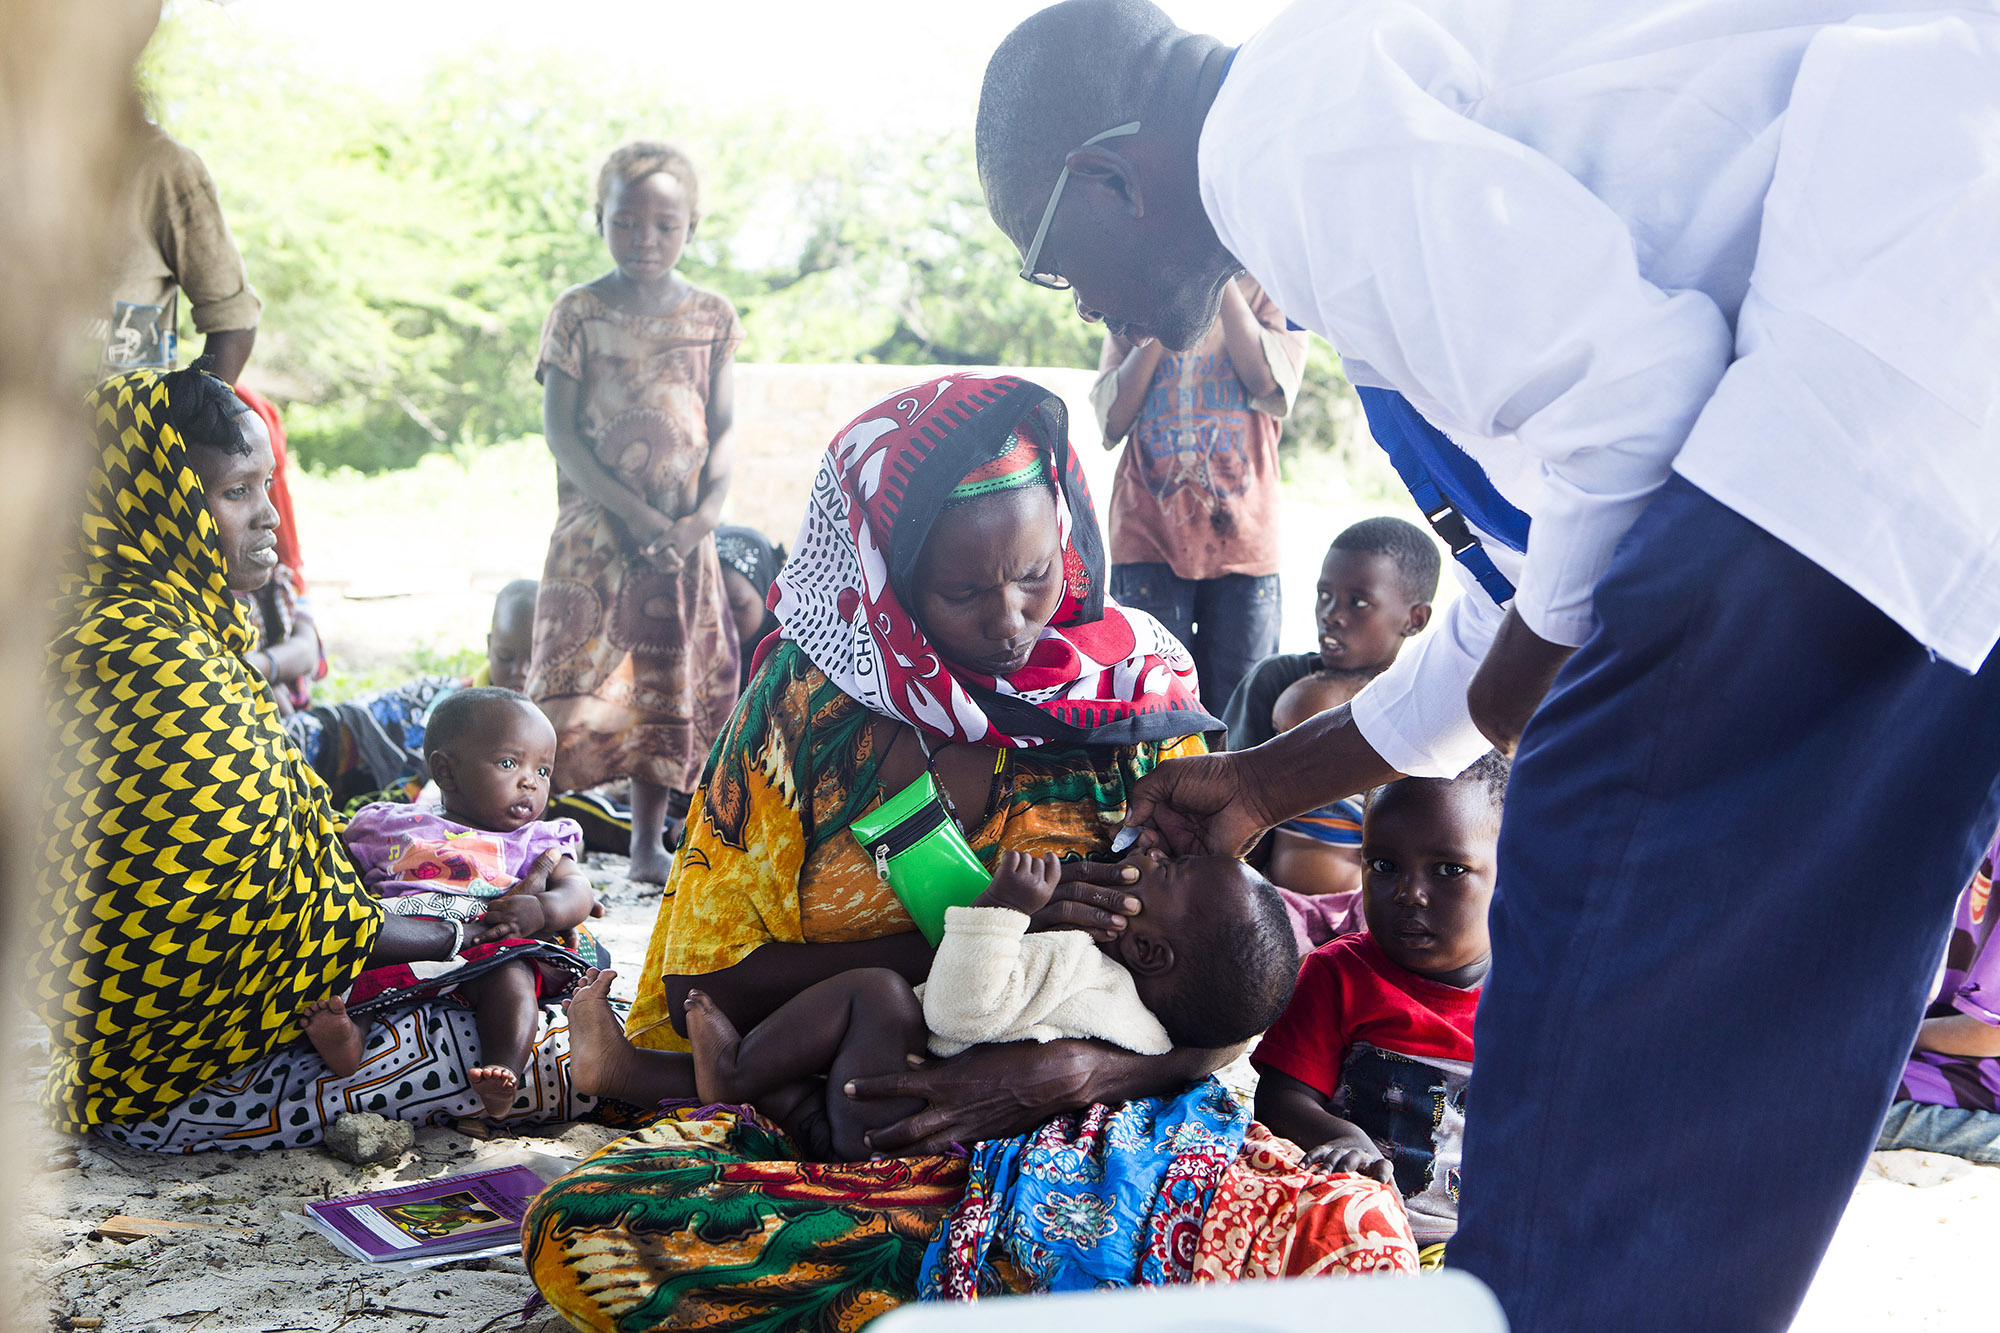 Nurse-Kalu-Harrison-gives-vaccine-to-a-baby-in-Kiangwe-village